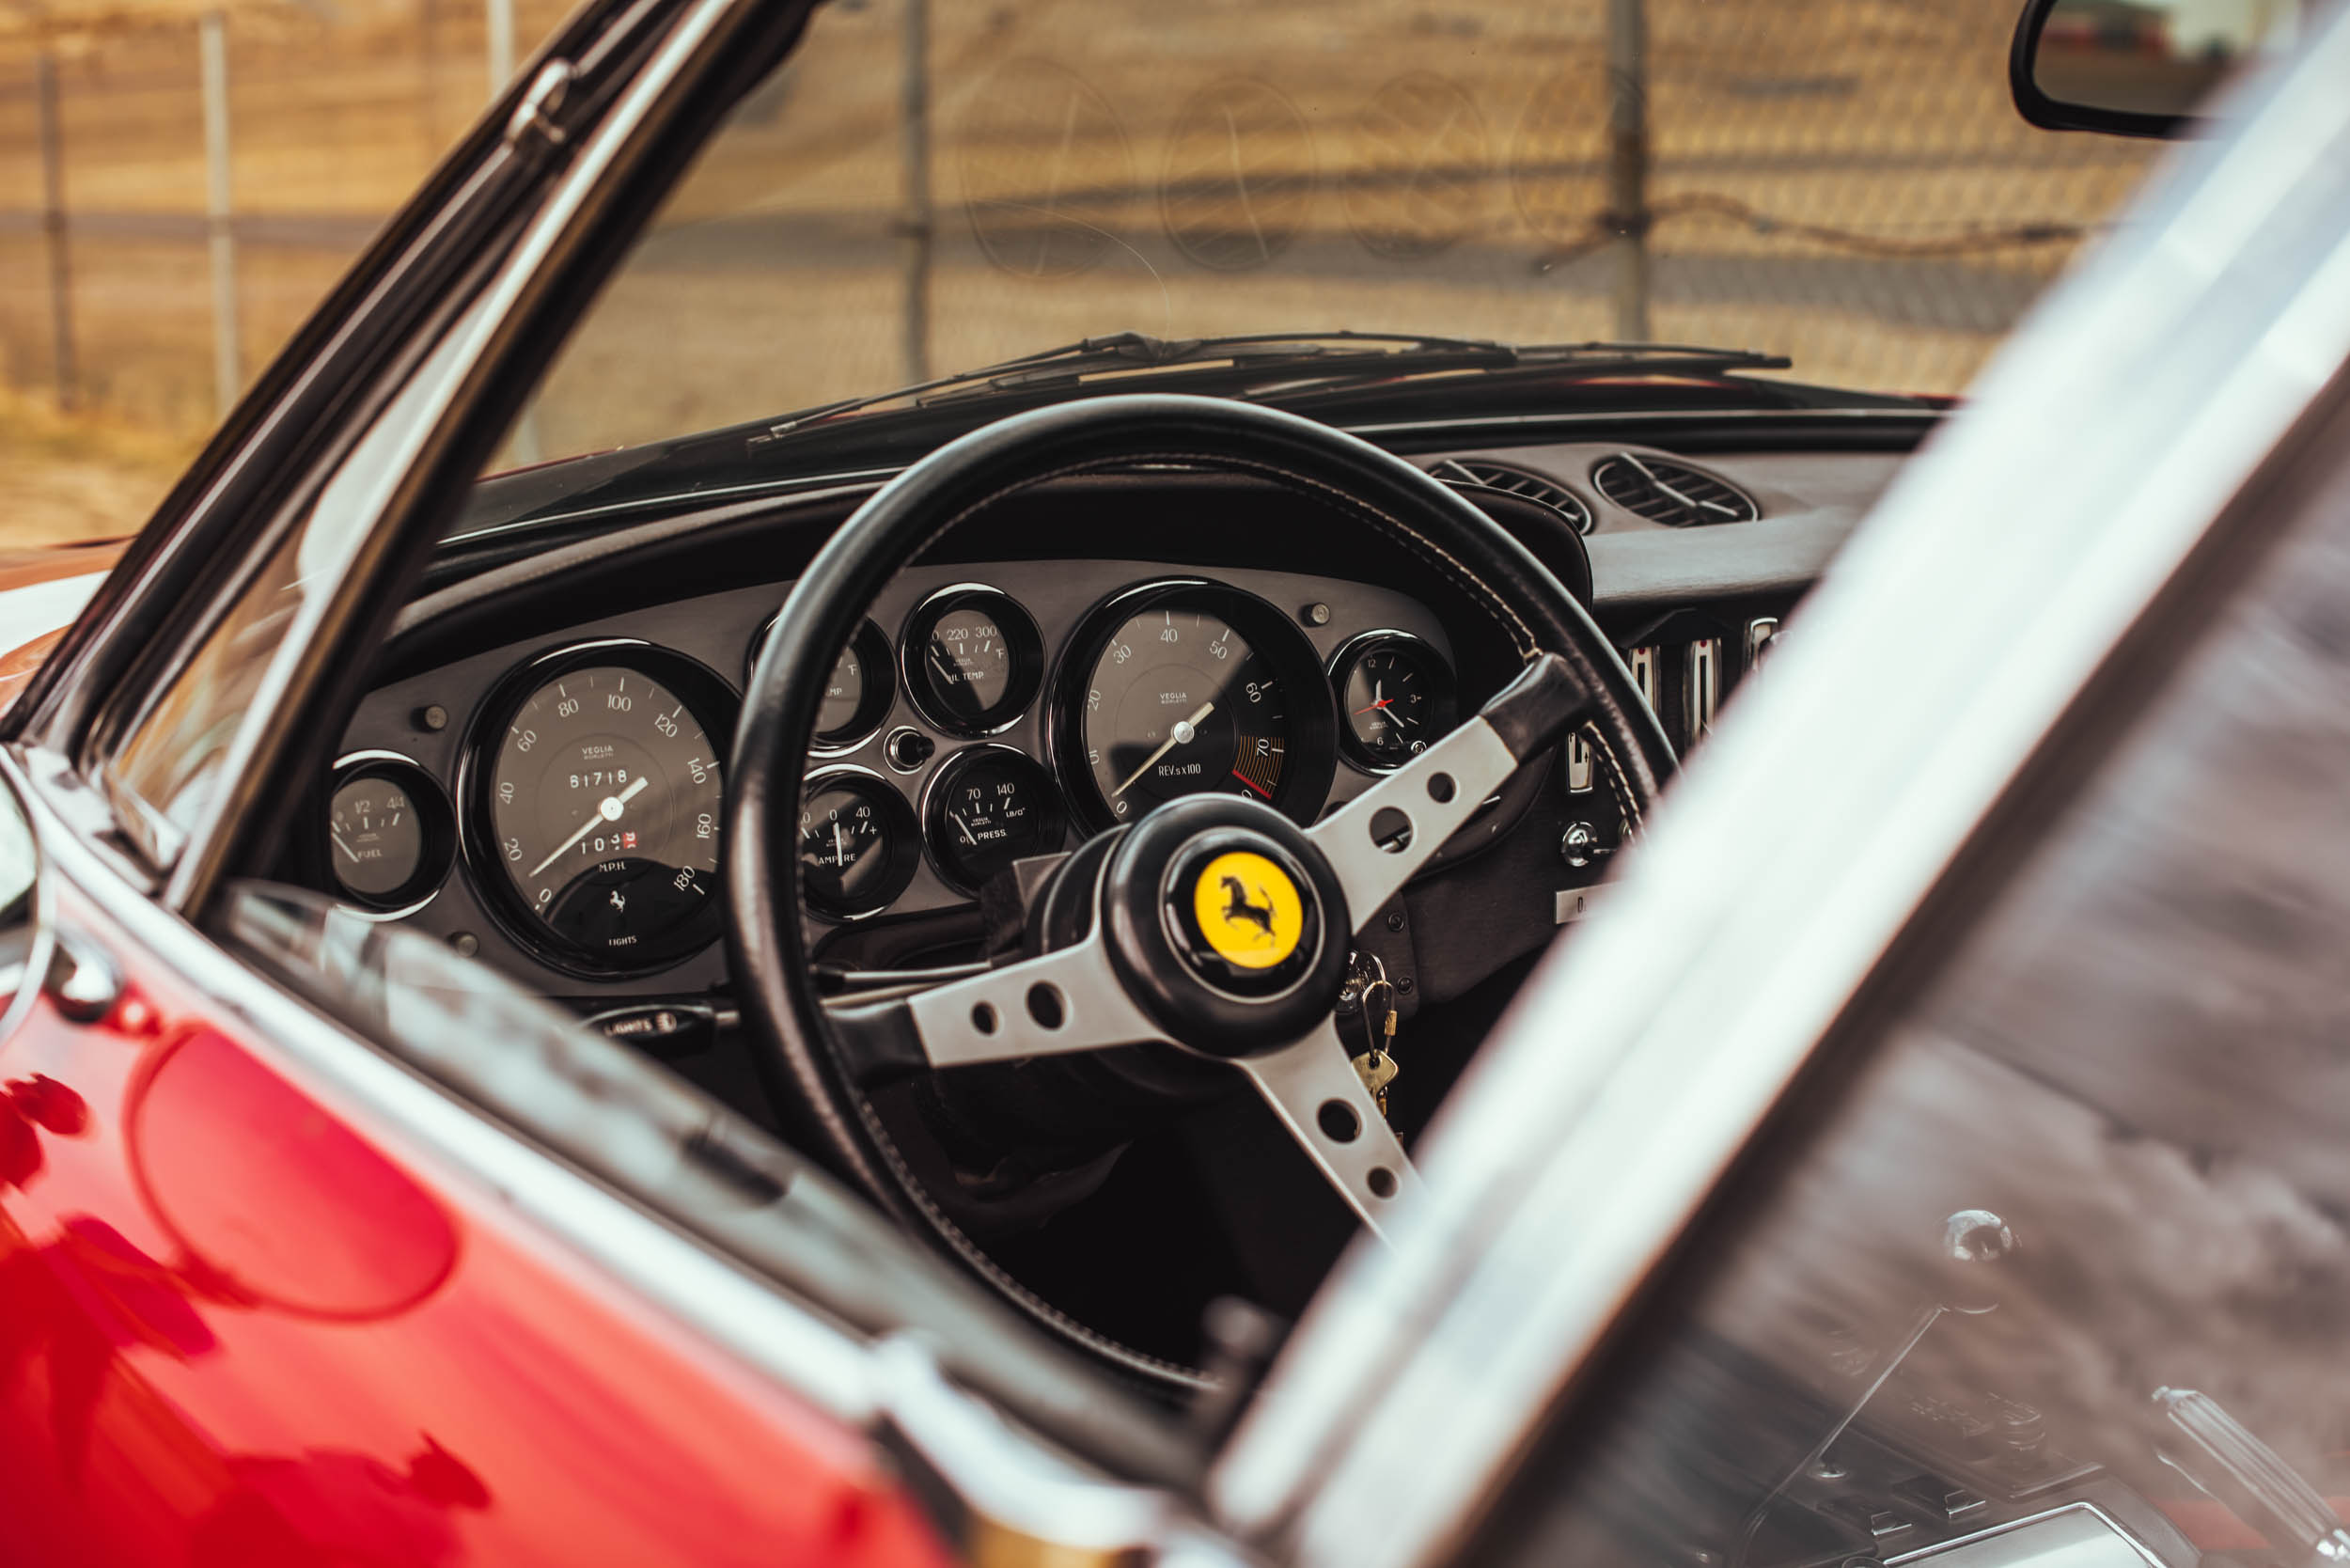 1971 Ferrari Daytona 365 GTB/4 steering wheel